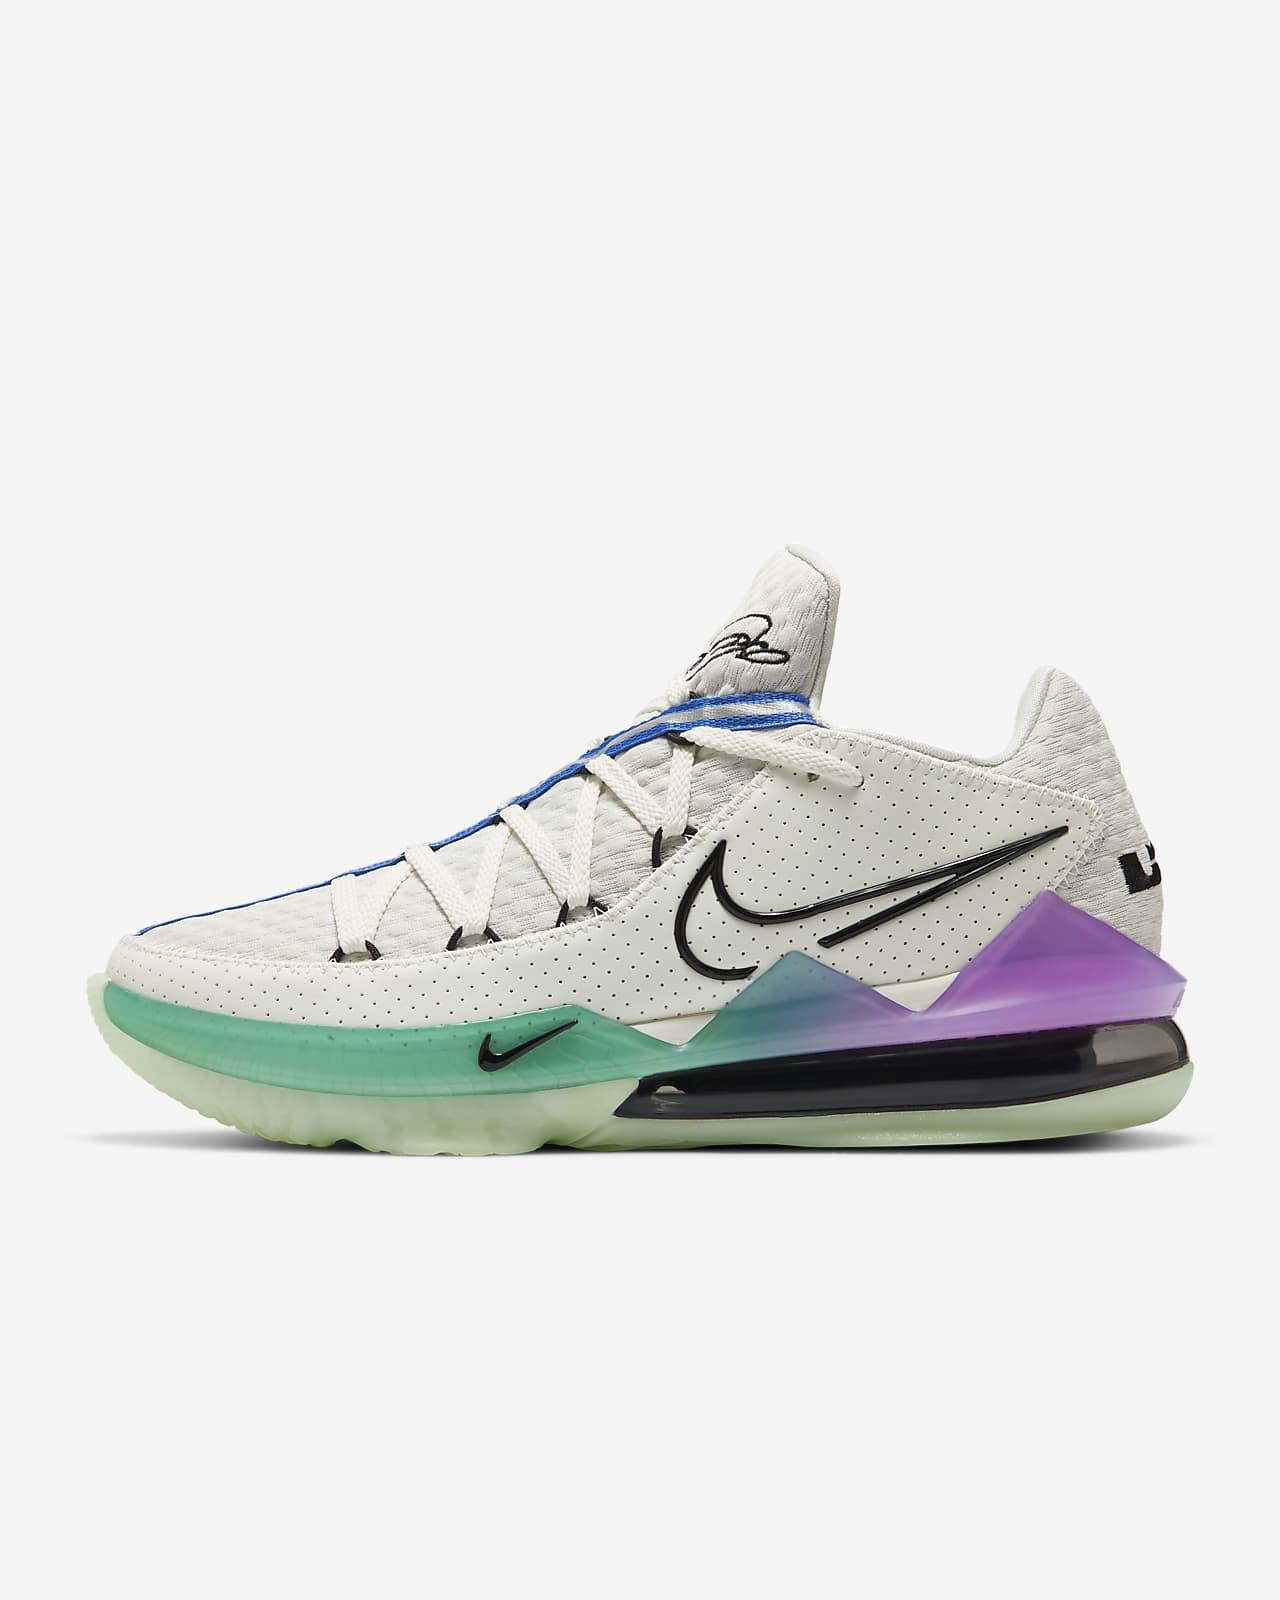 LeBron 17 Low Basketballschuh